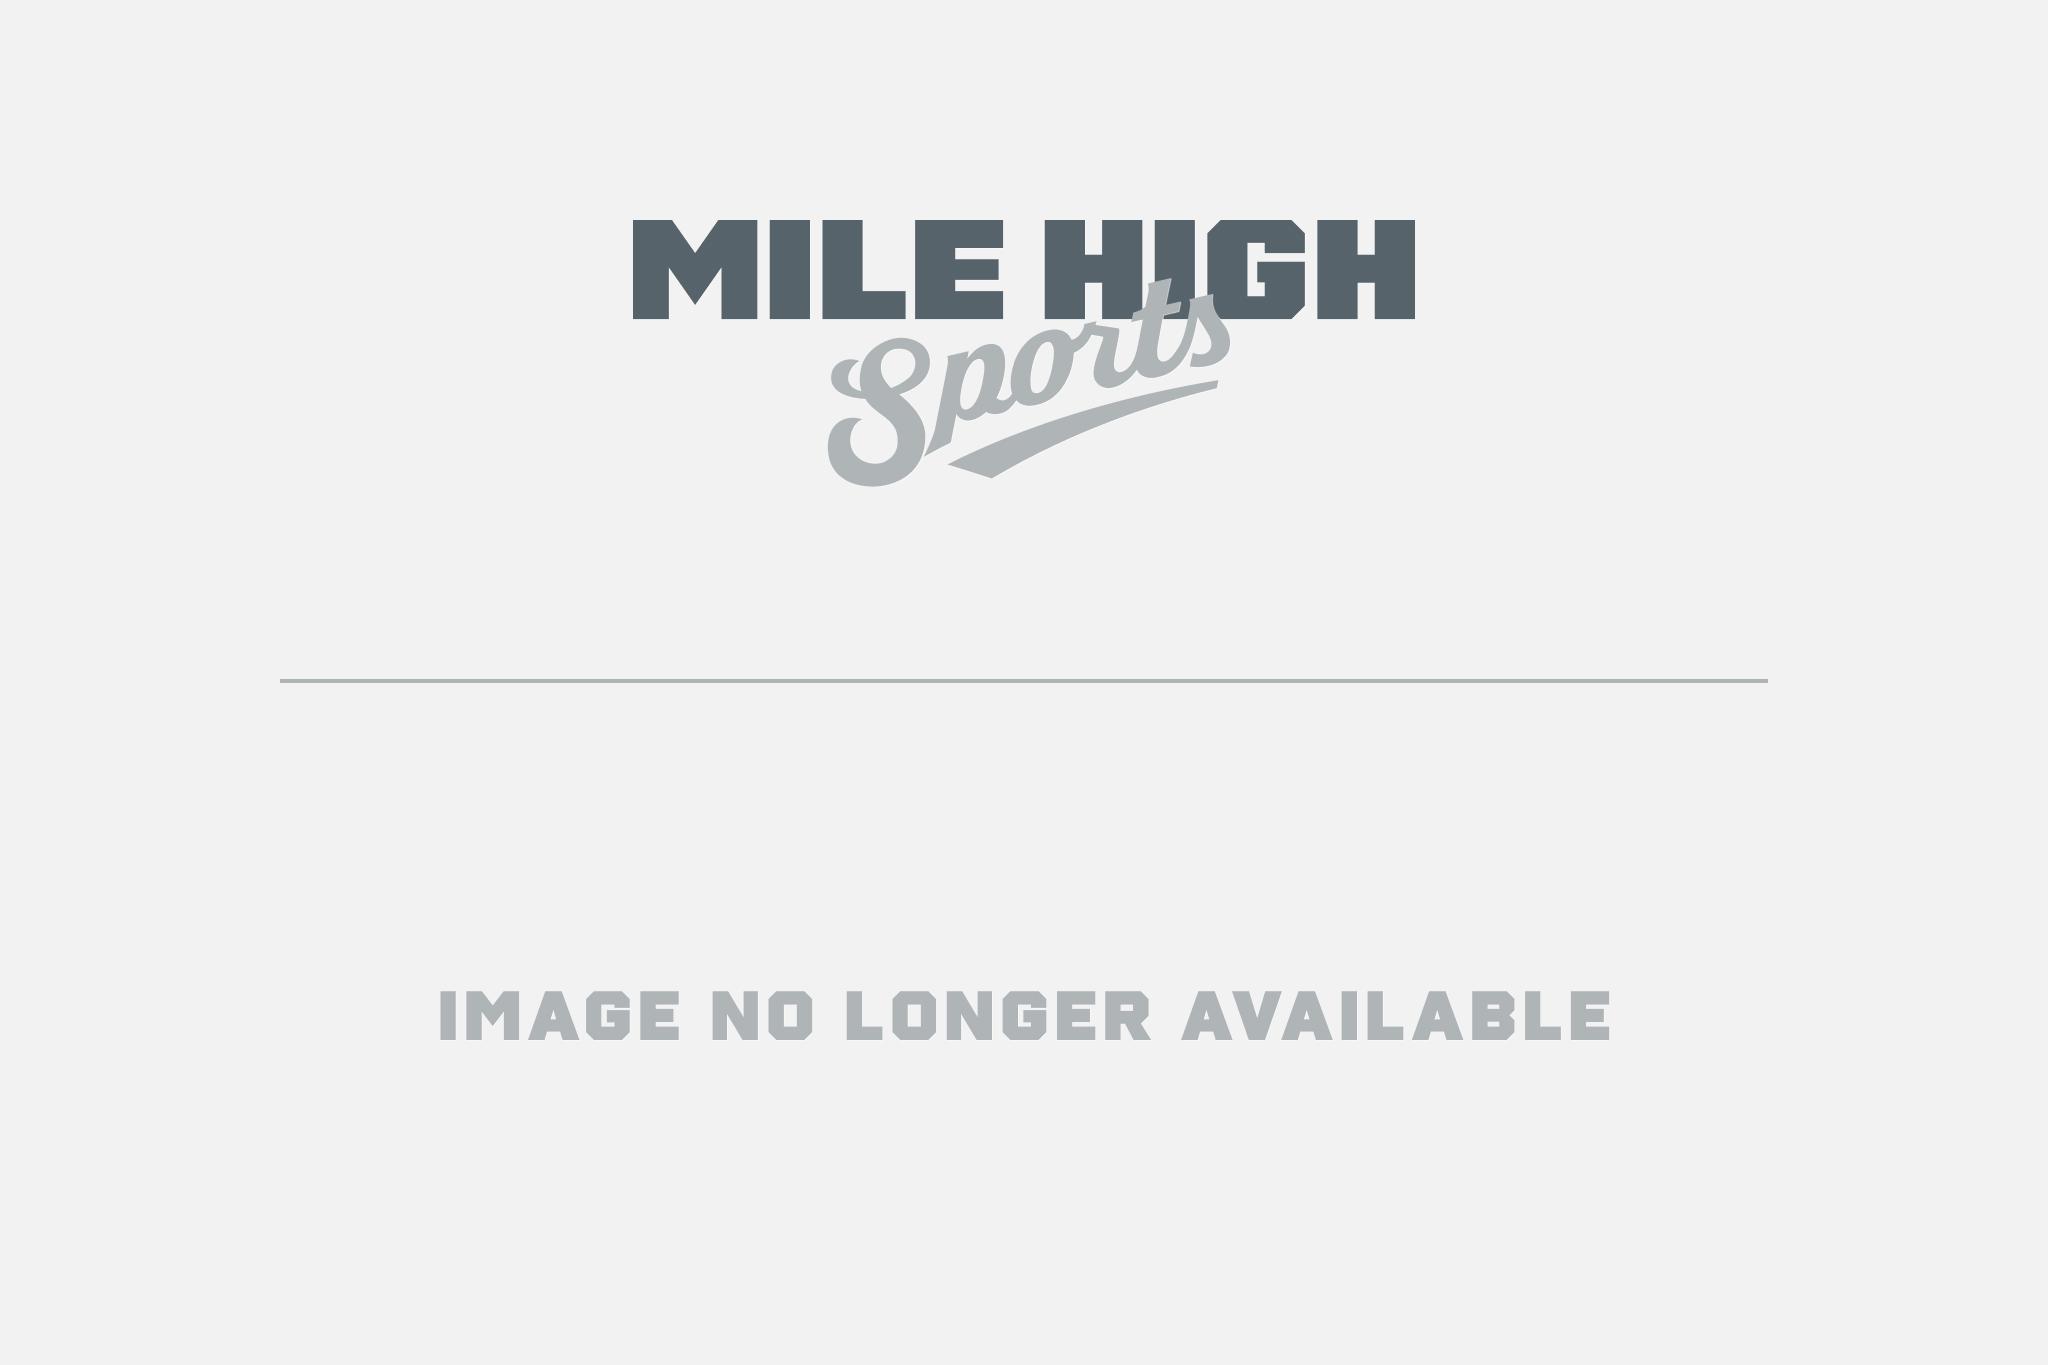 Valor Christian High School quarterback Luke McCaffrey -- PHOTO CREDIT: Paige Stingley/Valor Christian High School